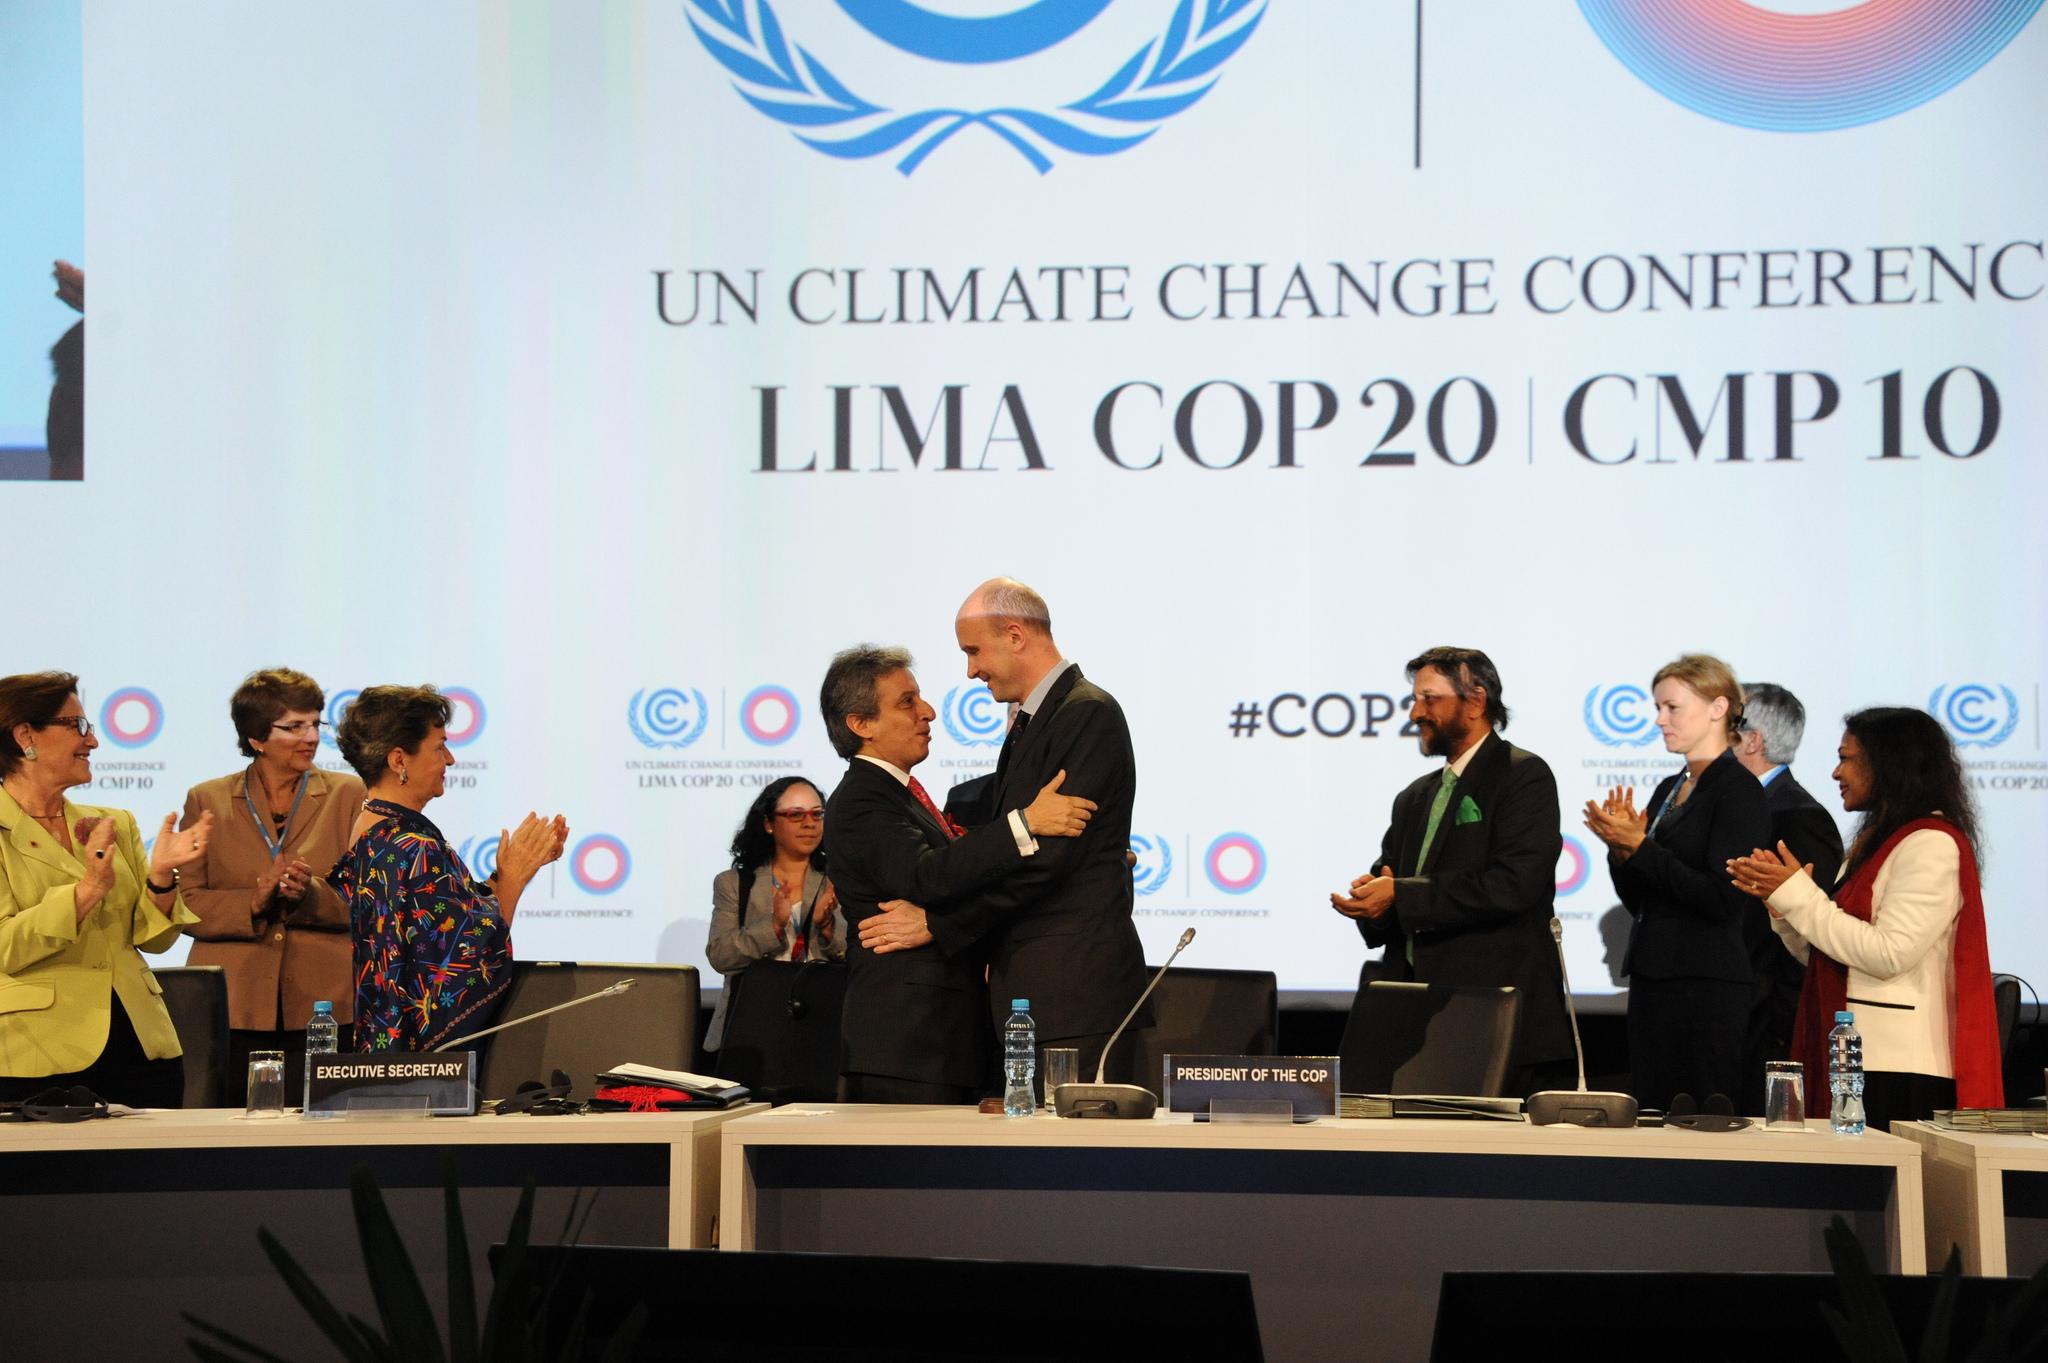 Lima Climate Change Talks Reach Global Warming Agreement Euractiv